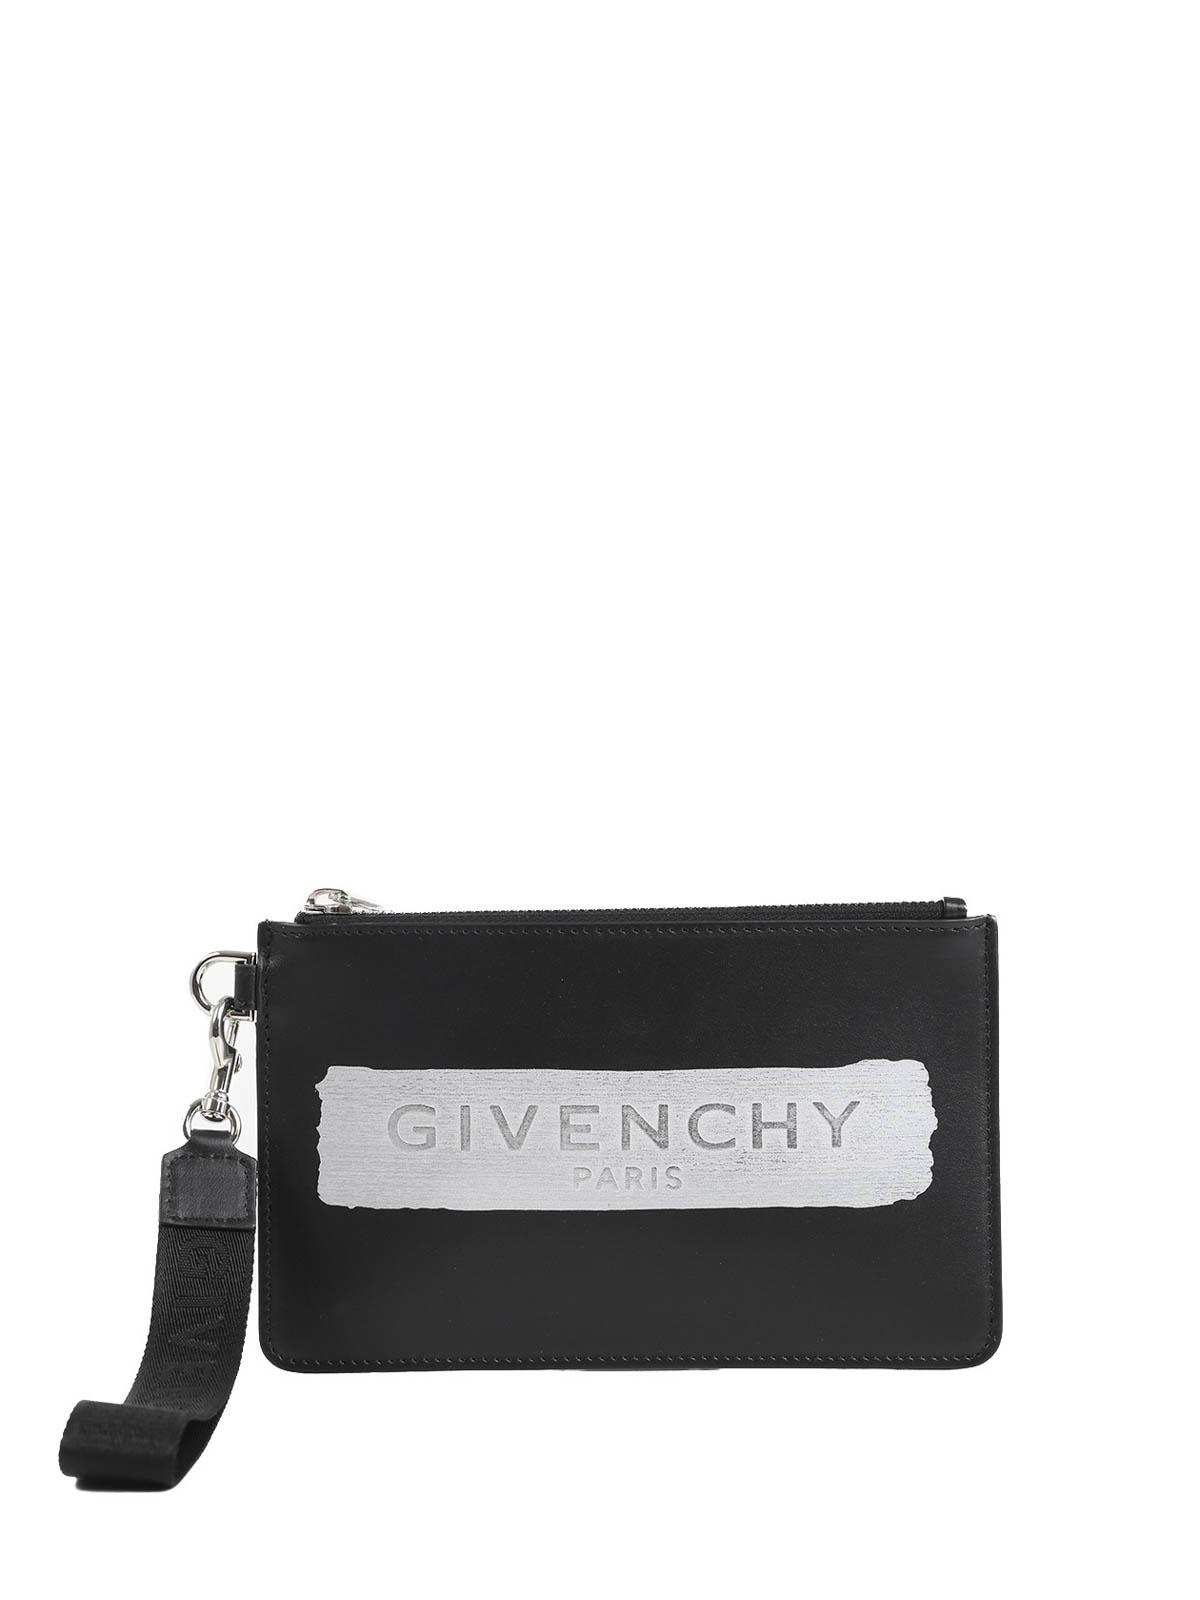 Givenchy Logo Stripe Clutch In Black